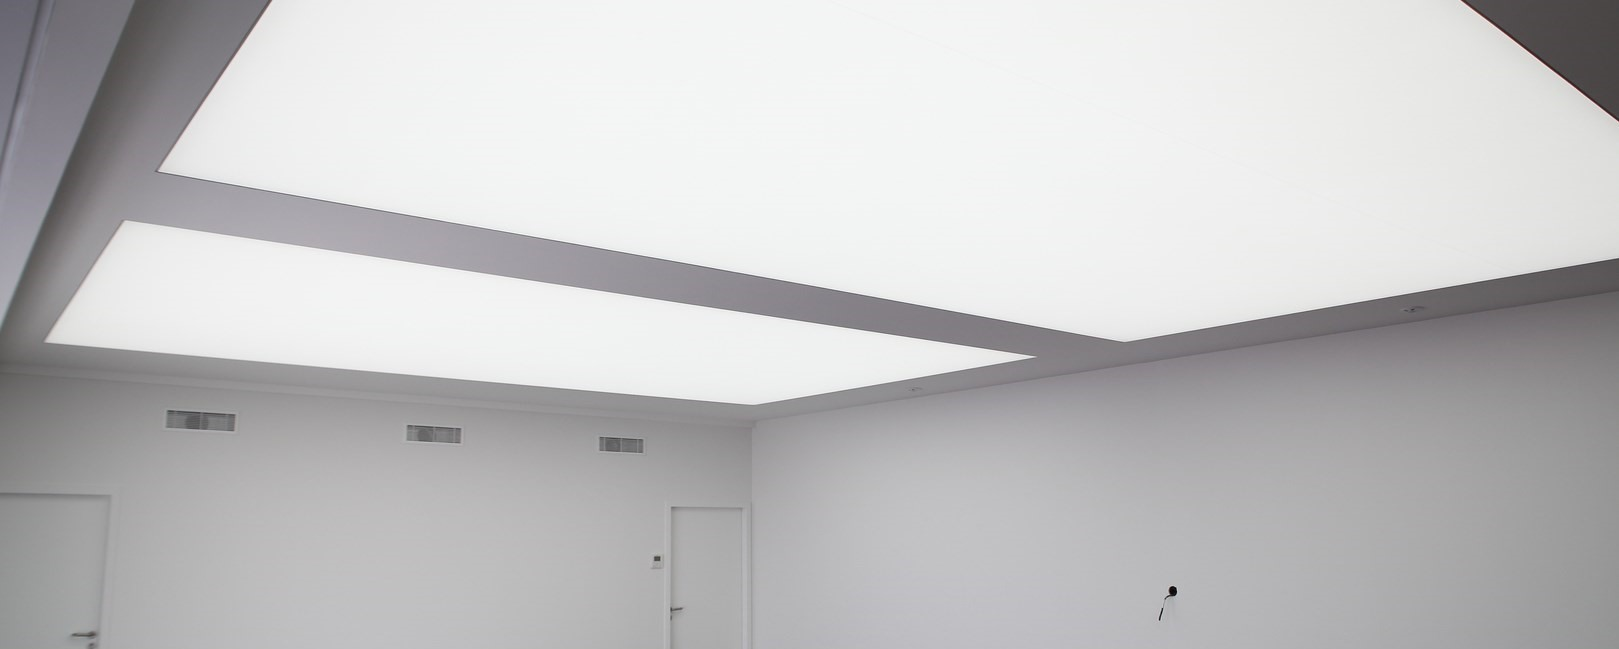 drome plafond tendu menuiseries agencements plafond tendu. Black Bedroom Furniture Sets. Home Design Ideas